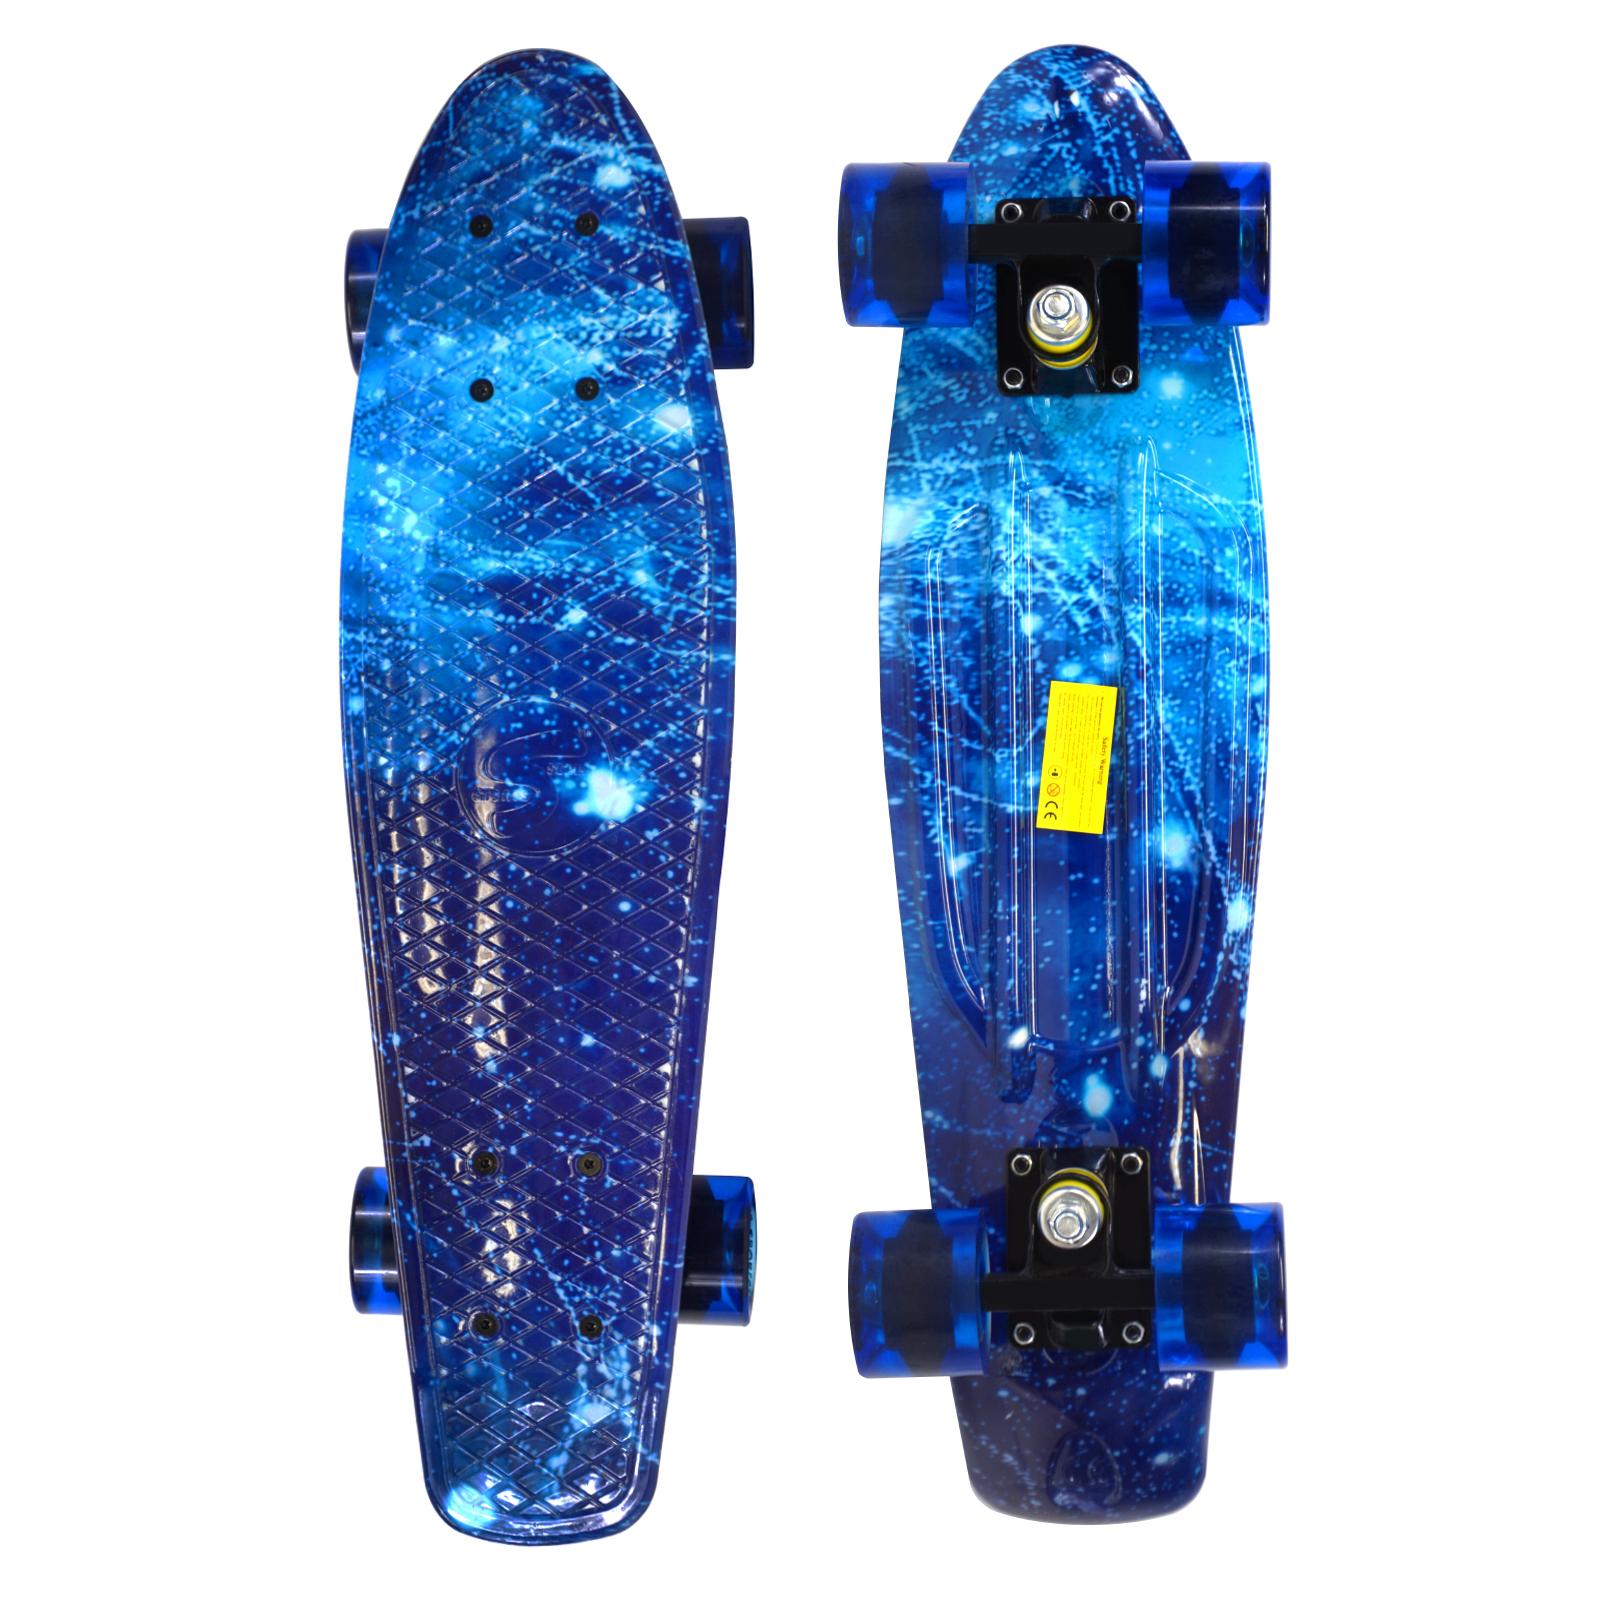 Skateboard Complete 22 inches Galaxy Board Cruiser